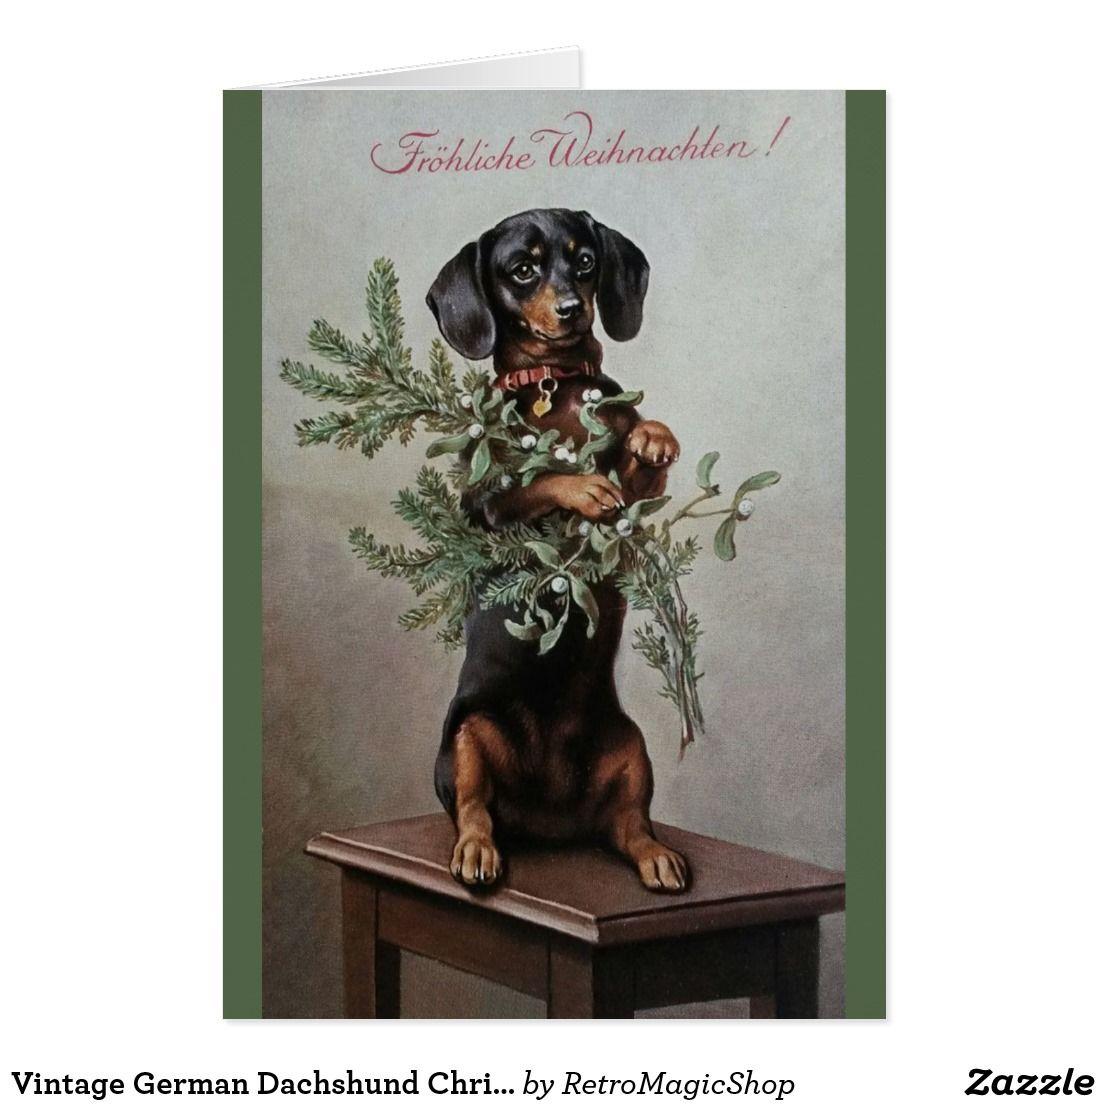 Vintage german dachshund christmas greeting card vintage vintage german dachshund christmas greeting card kristyandbryce Image collections